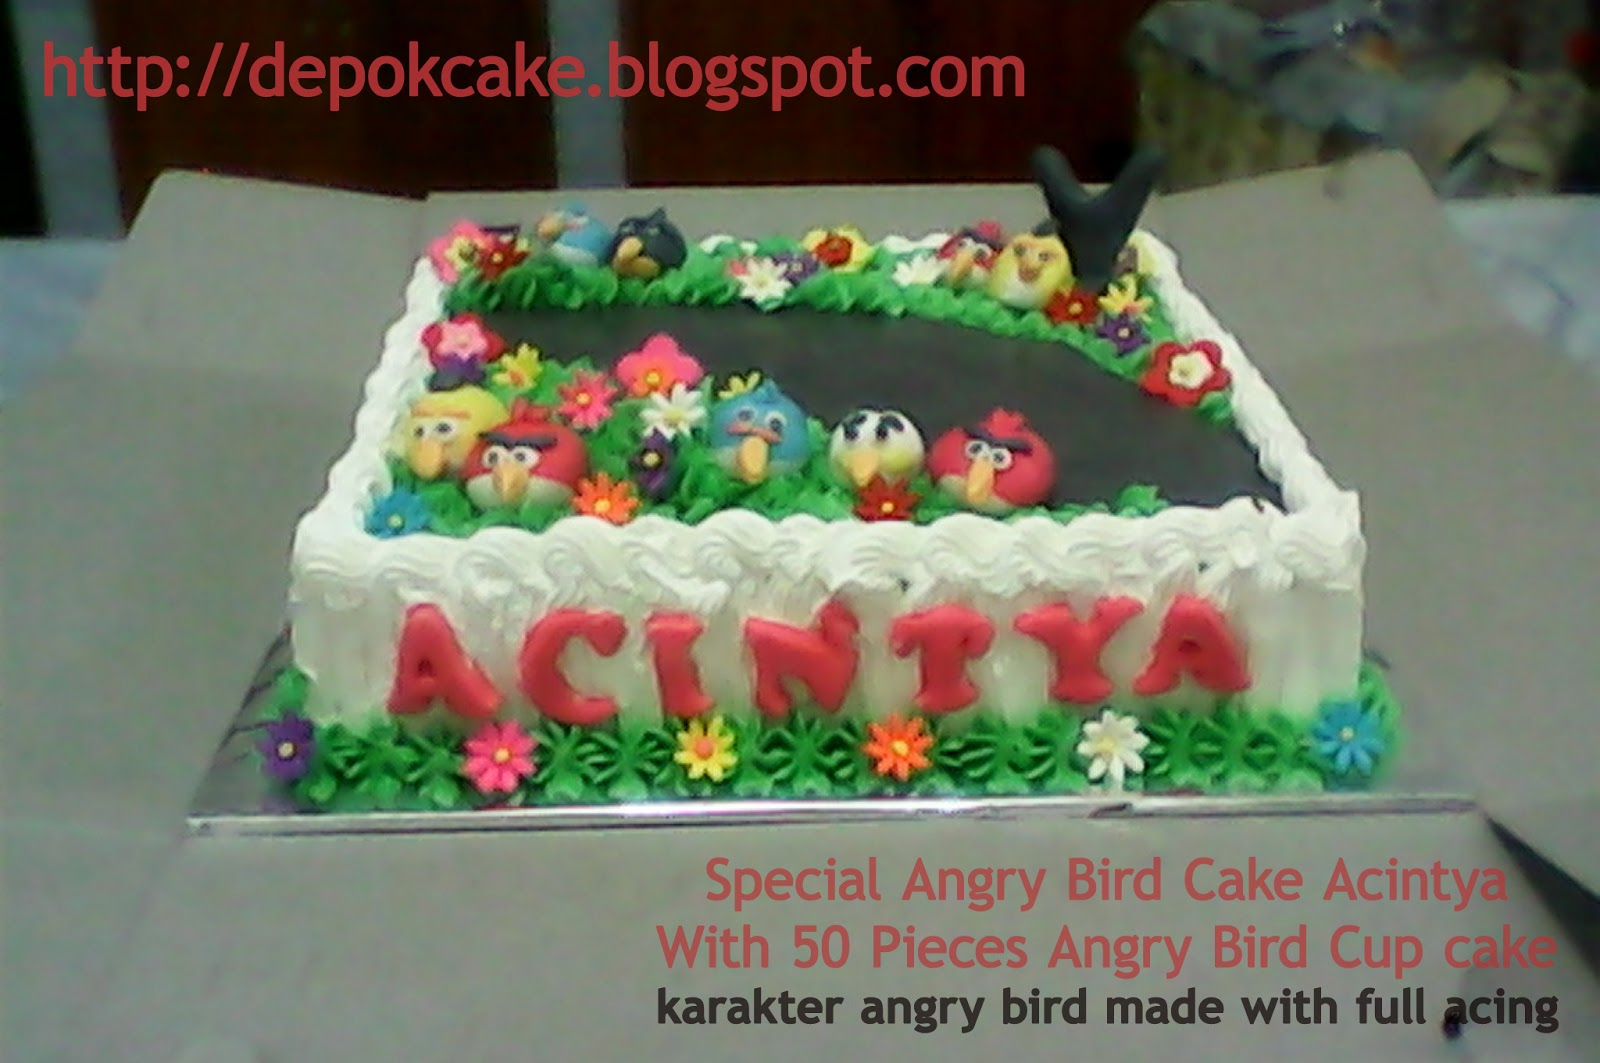 Kue Ulang Tahun Anak Lucu Dan Unik - bliblinews.com